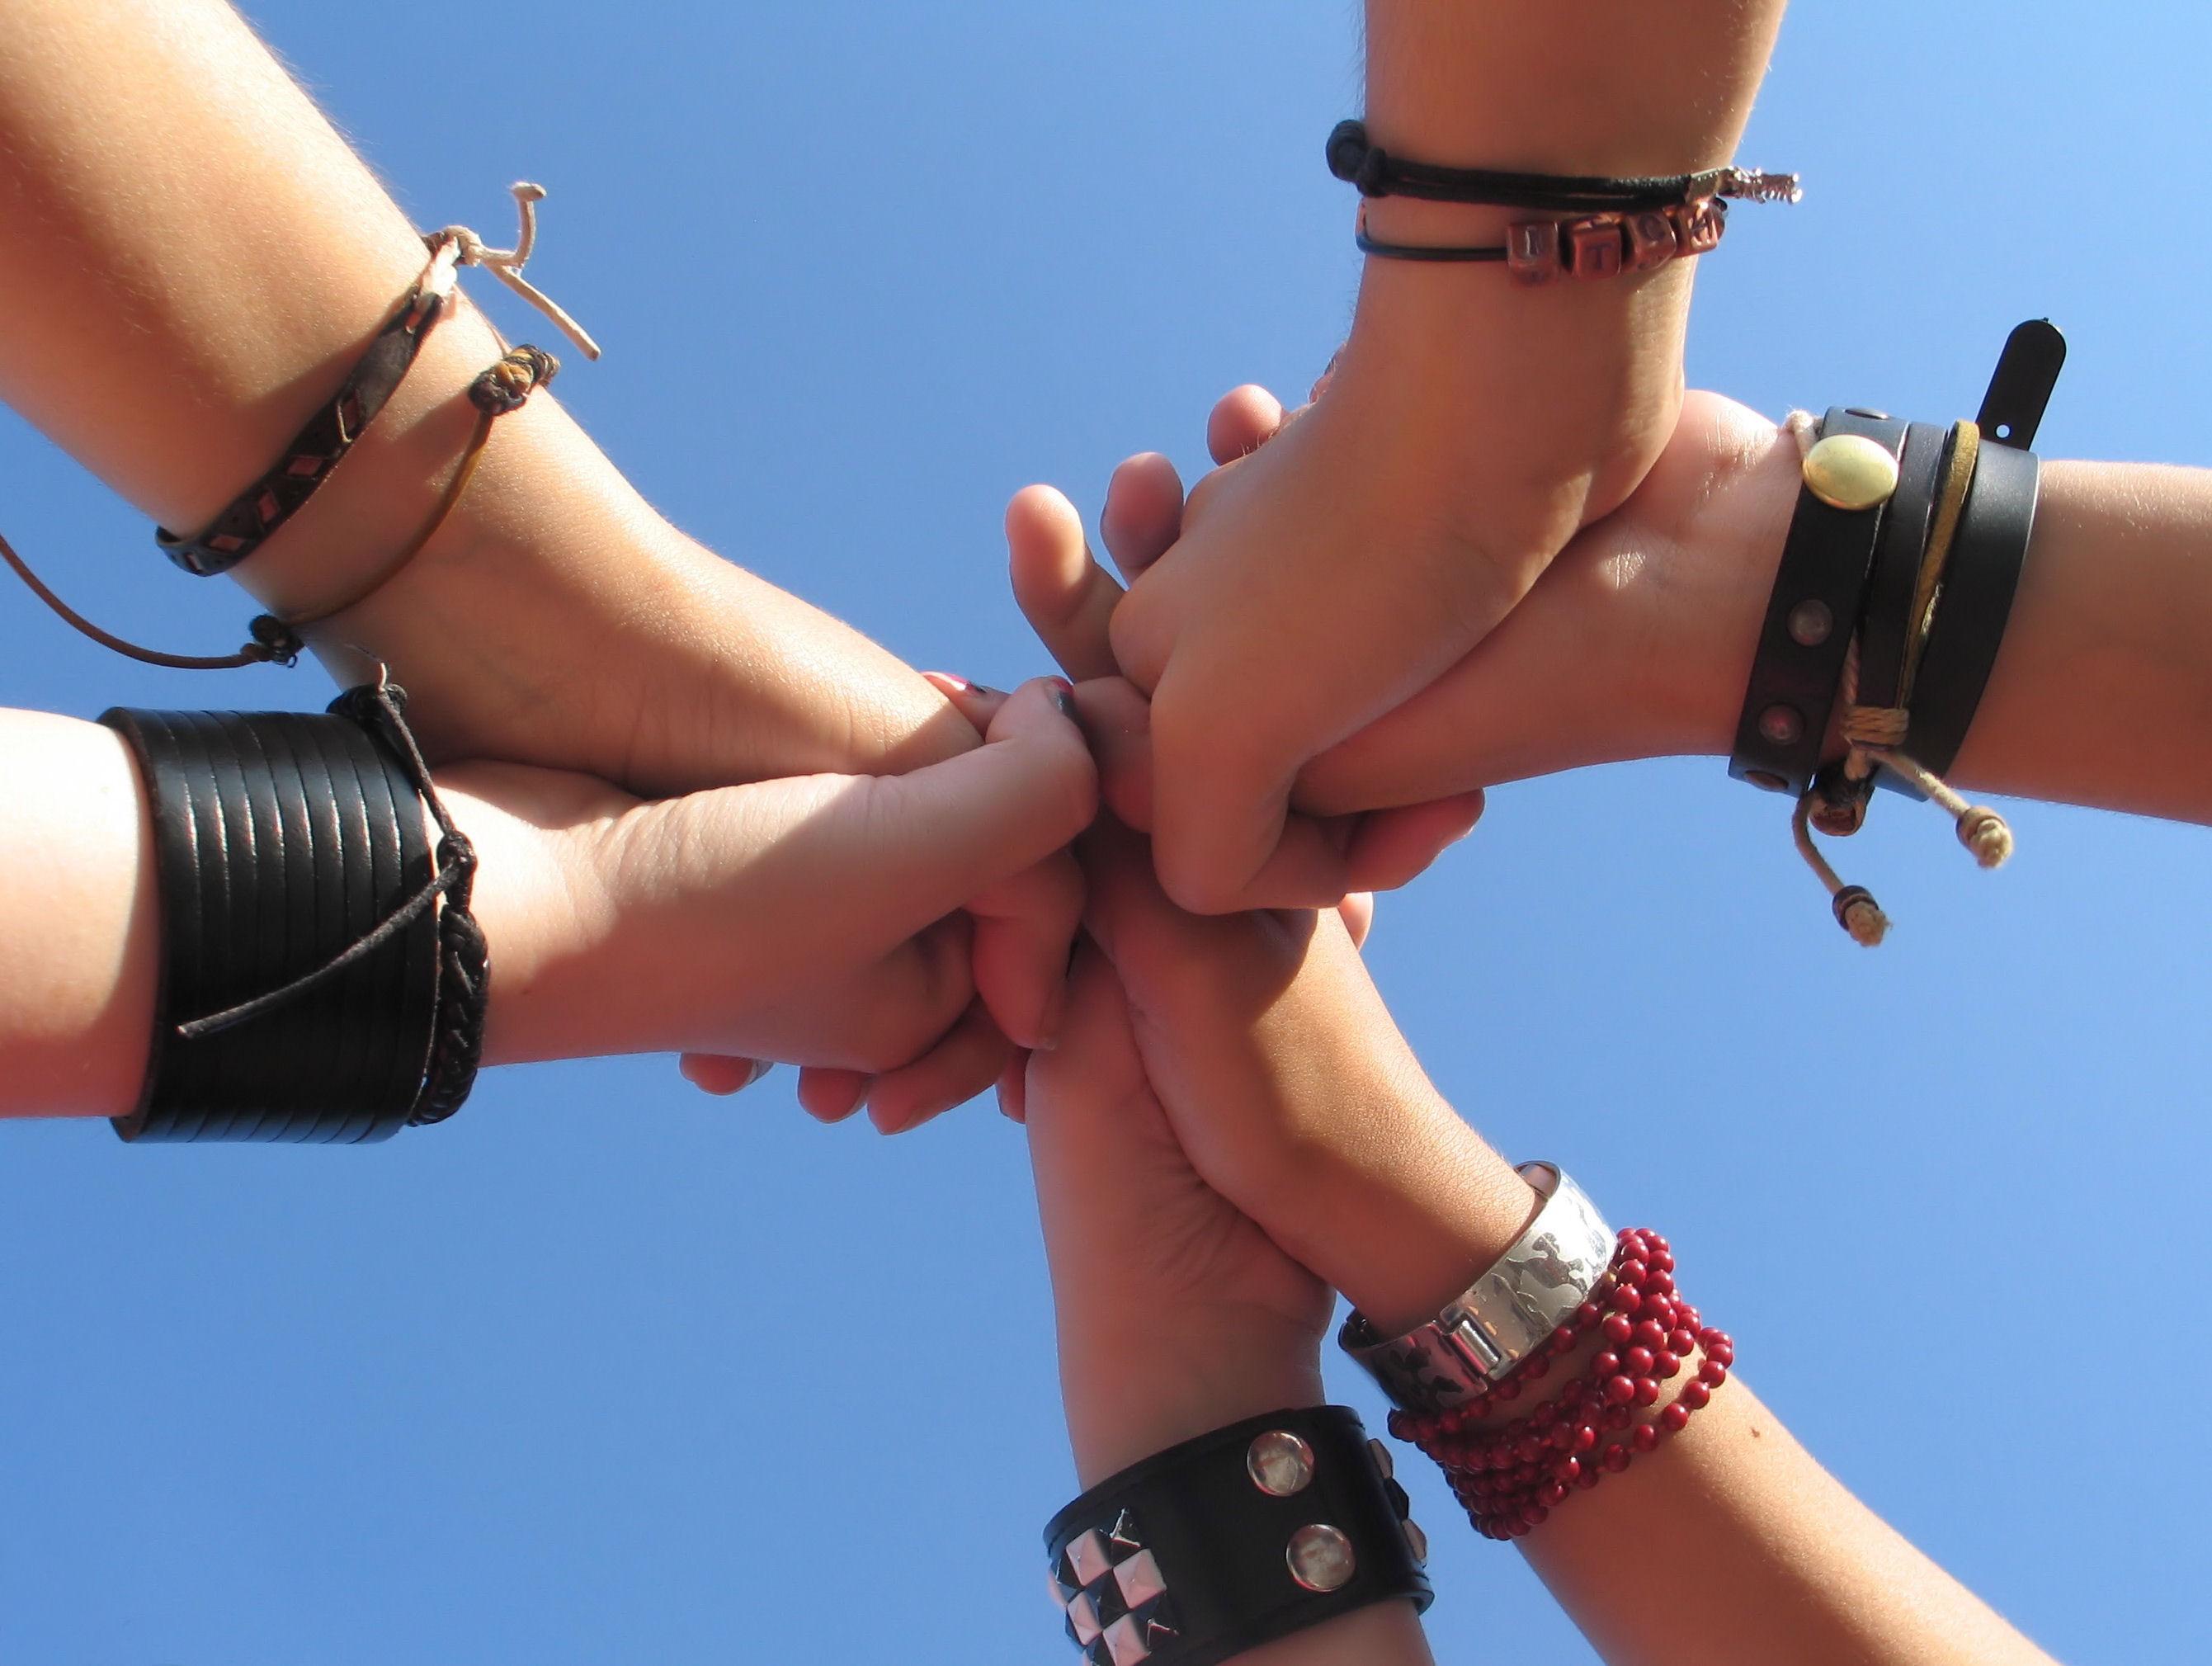 5 hands support